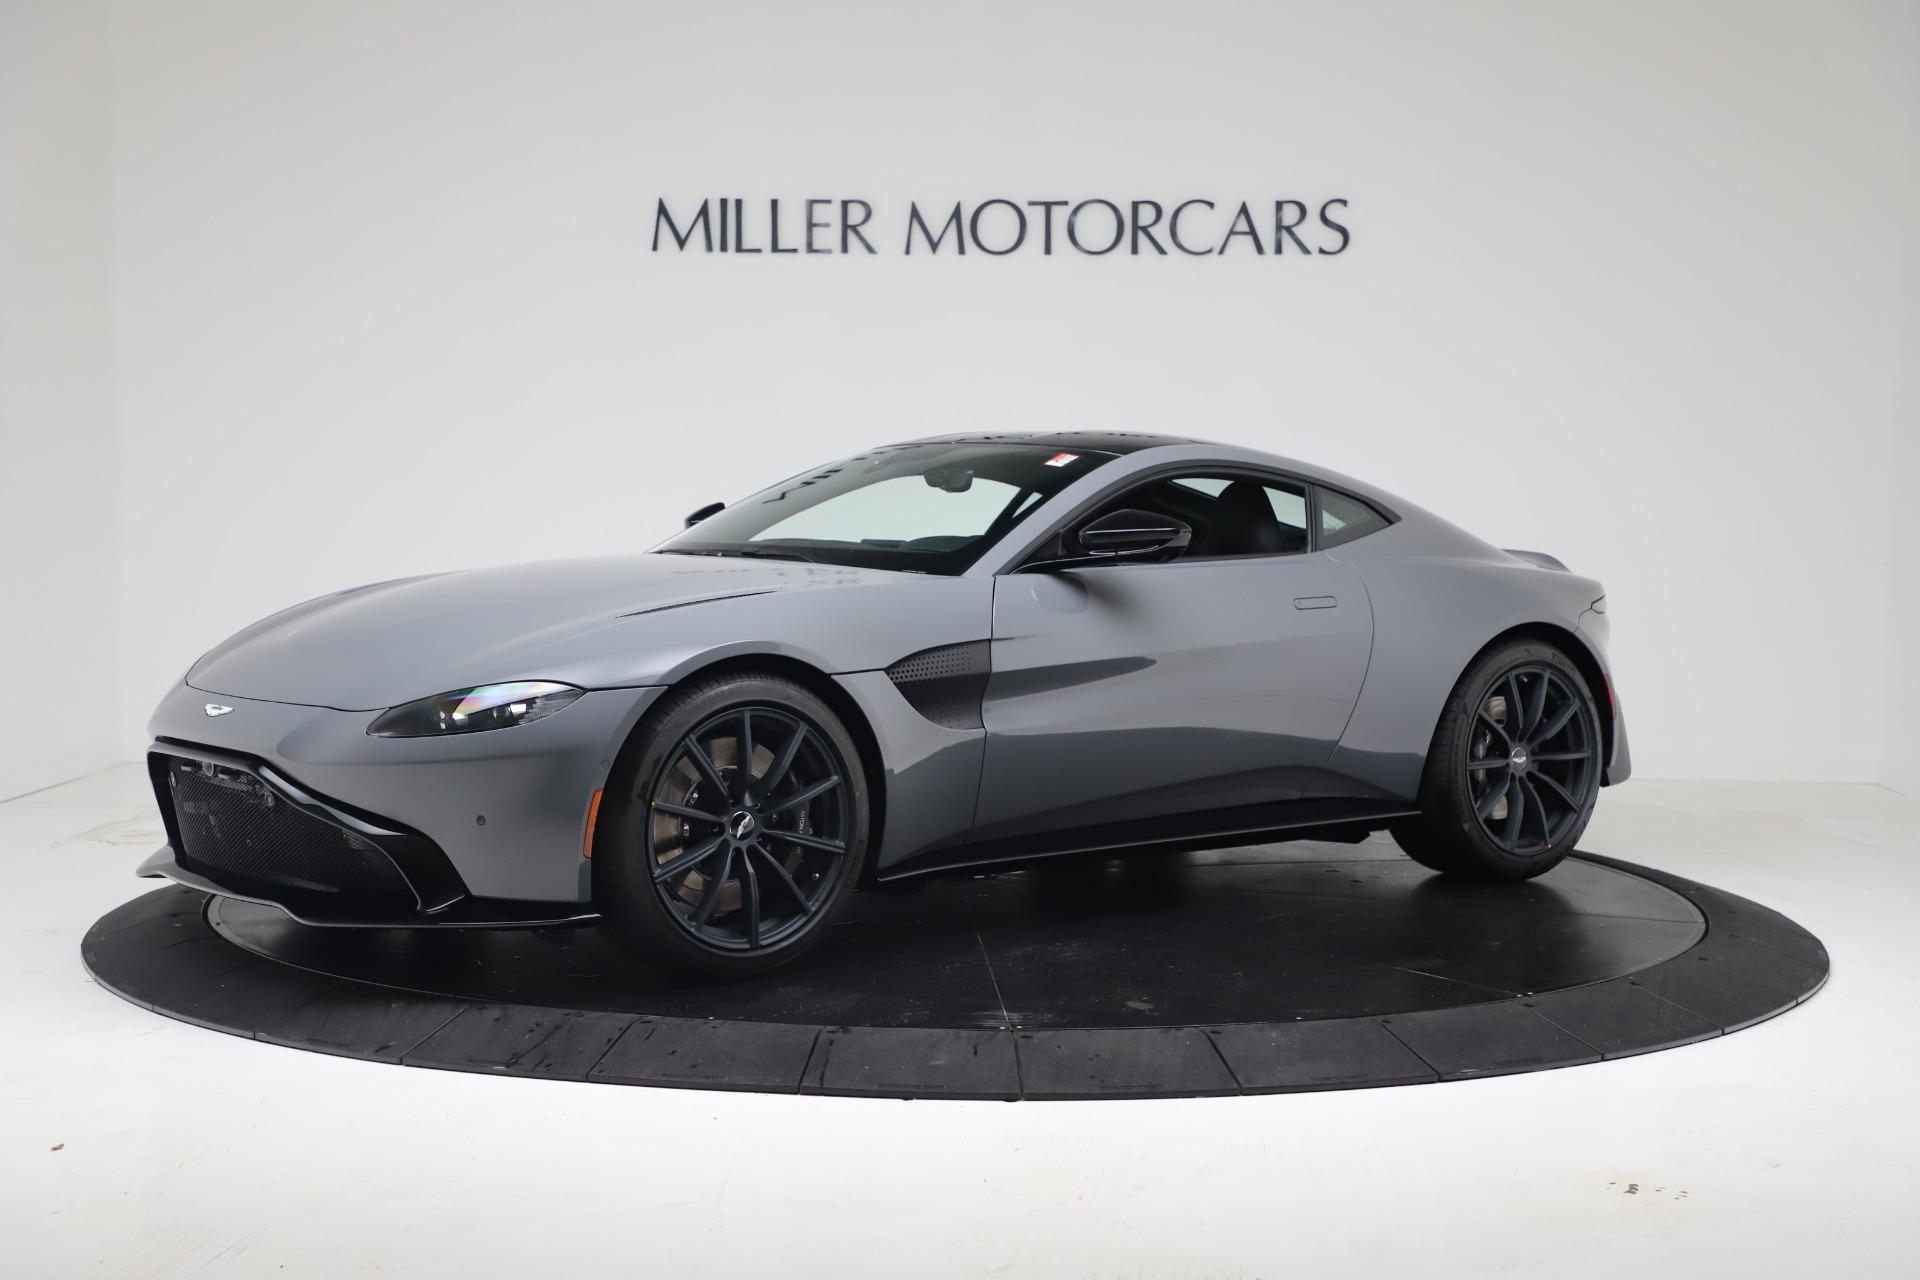 New 2020 Aston Martin Vantage Coupe for sale Sold at Bugatti of Greenwich in Greenwich CT 06830 1